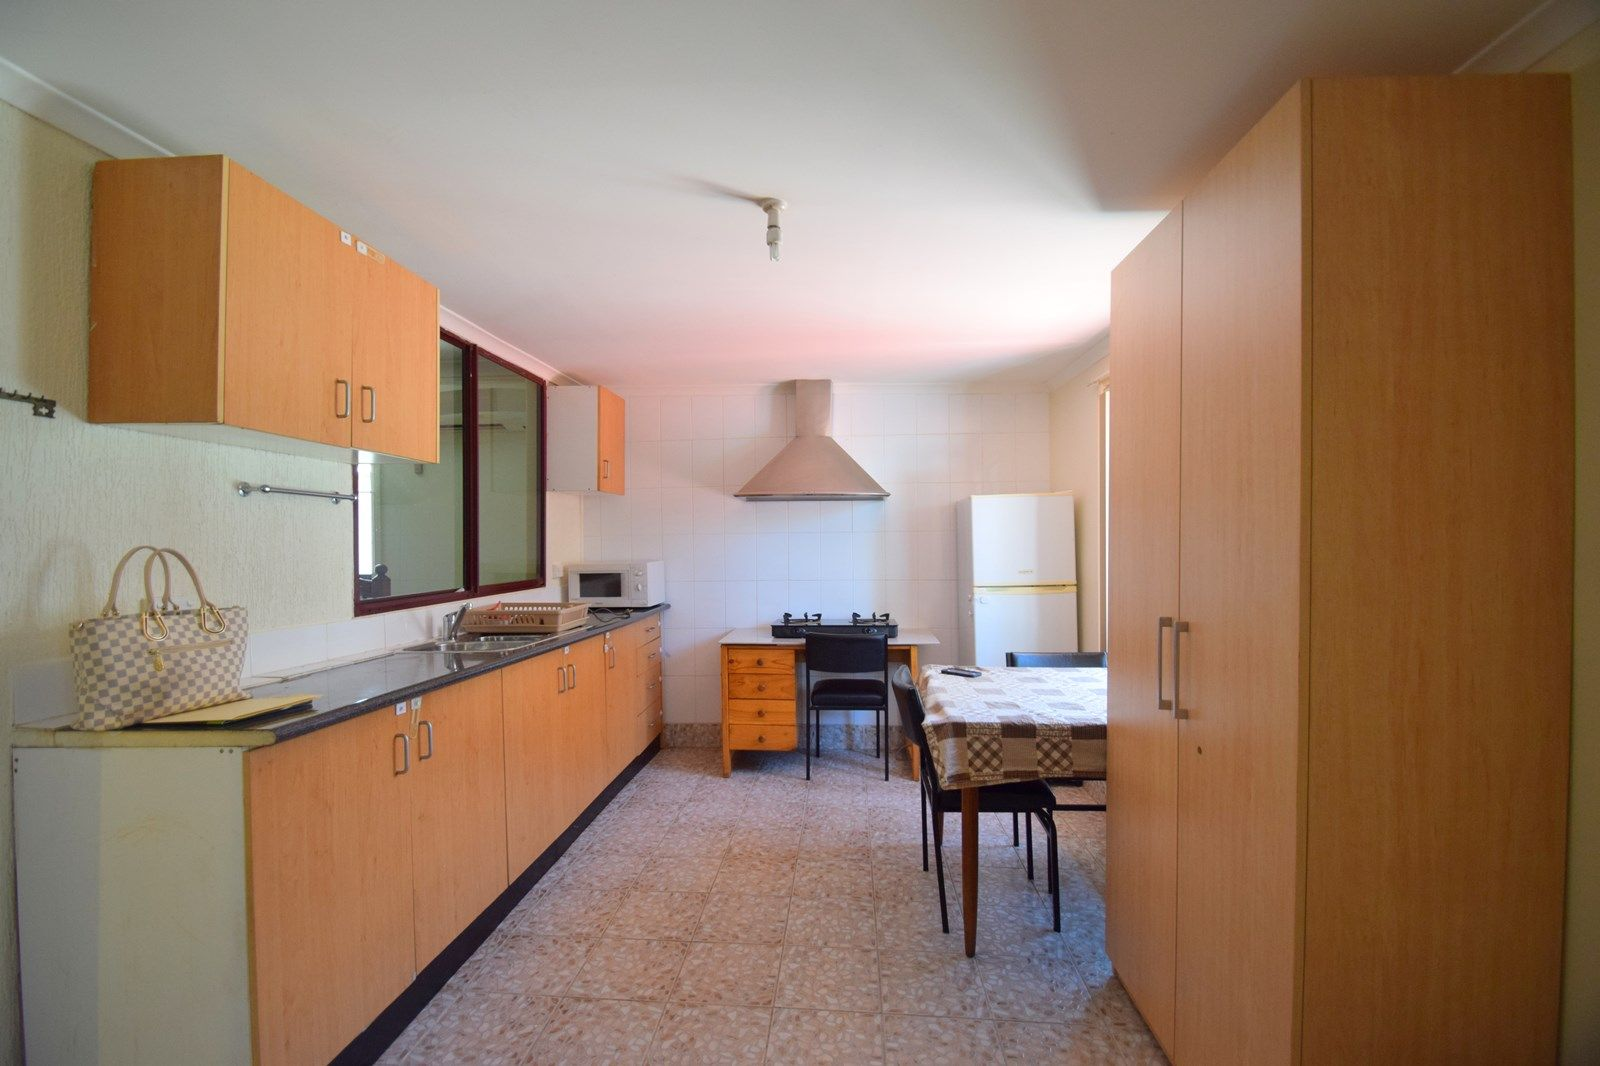 Flat 2, 6 Waratah Avenue, Casula NSW 2170, Image 1